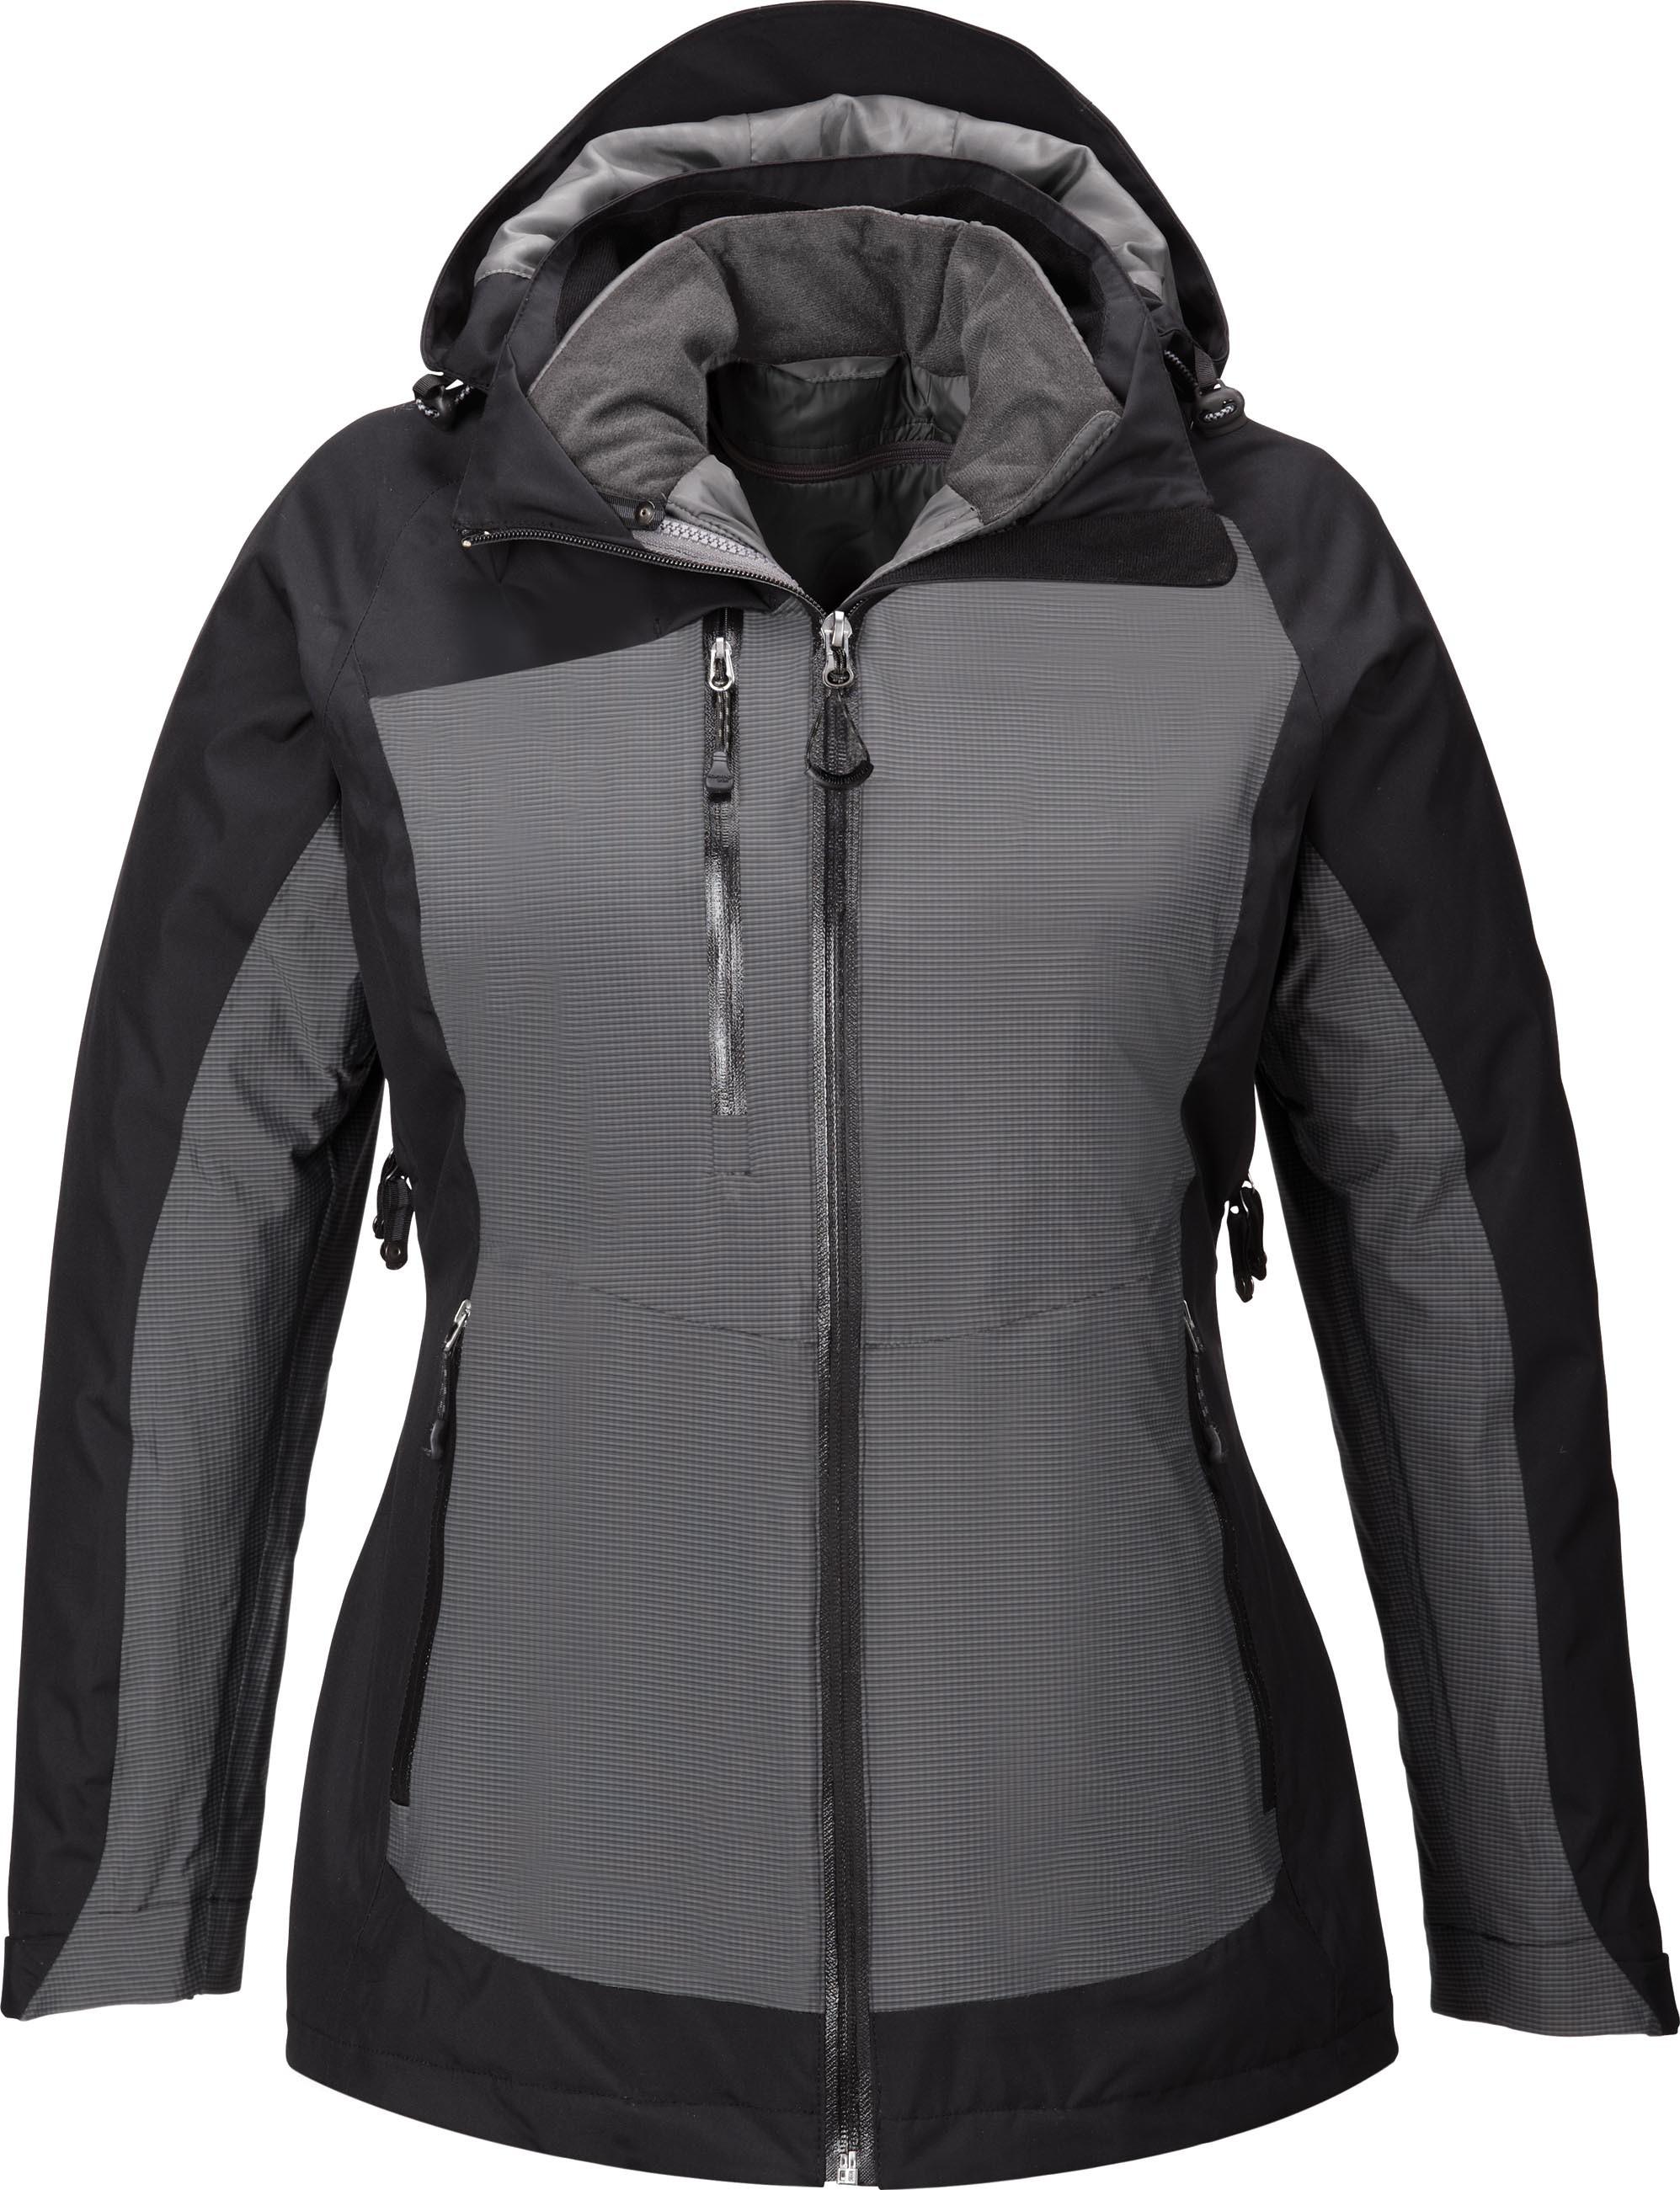 Ash City UTK 3 Warm.Logik 78663 - Alta Ladies' 3-In-1 Seam-Sealed Jacket With Insulated Liner